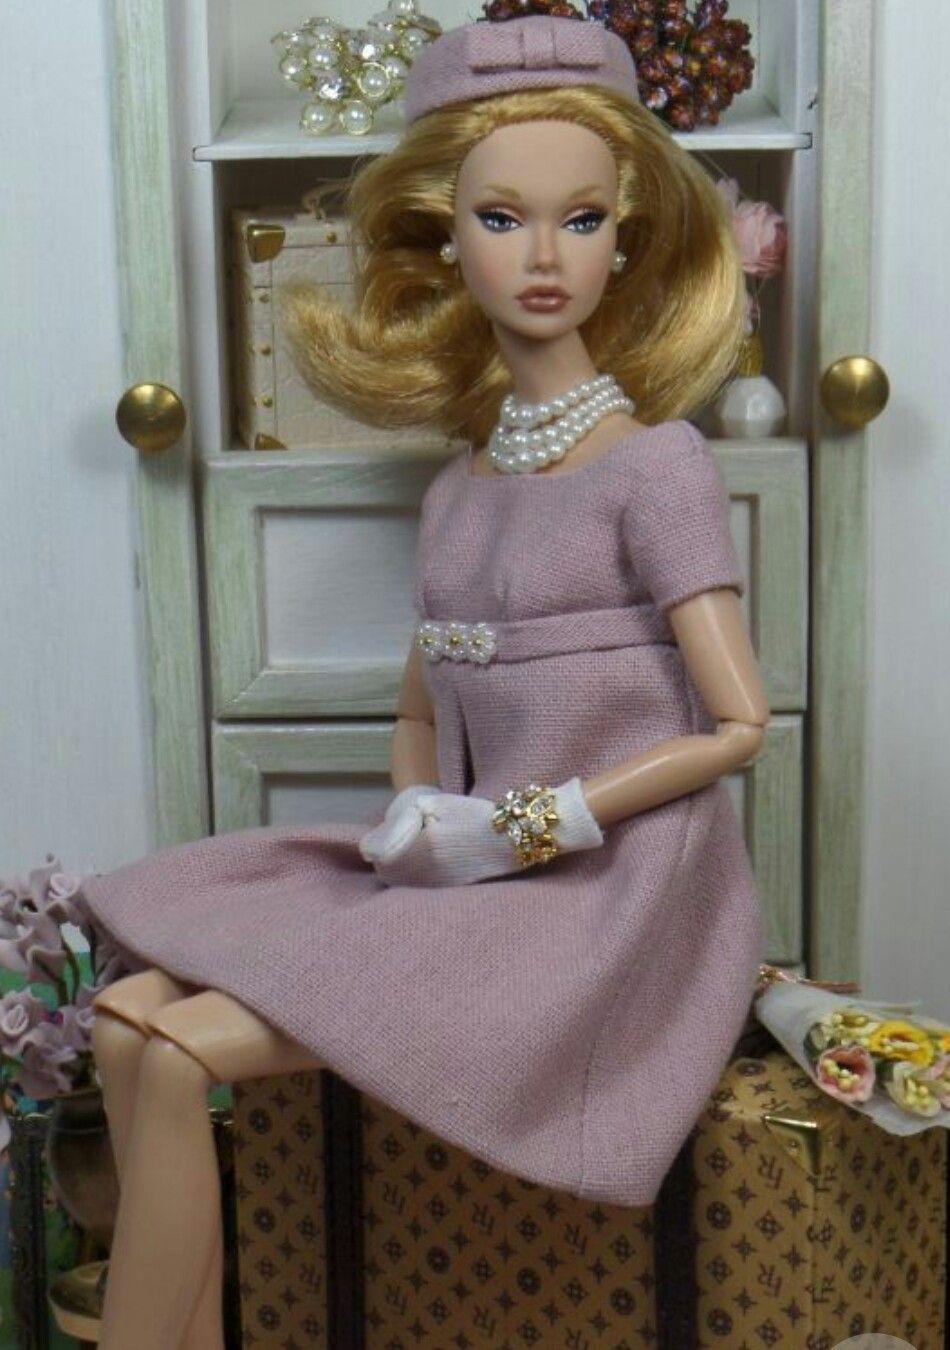 Pin de Lori Compton en Barbie & Dolls | Pinterest | Muñecas, Varios ...